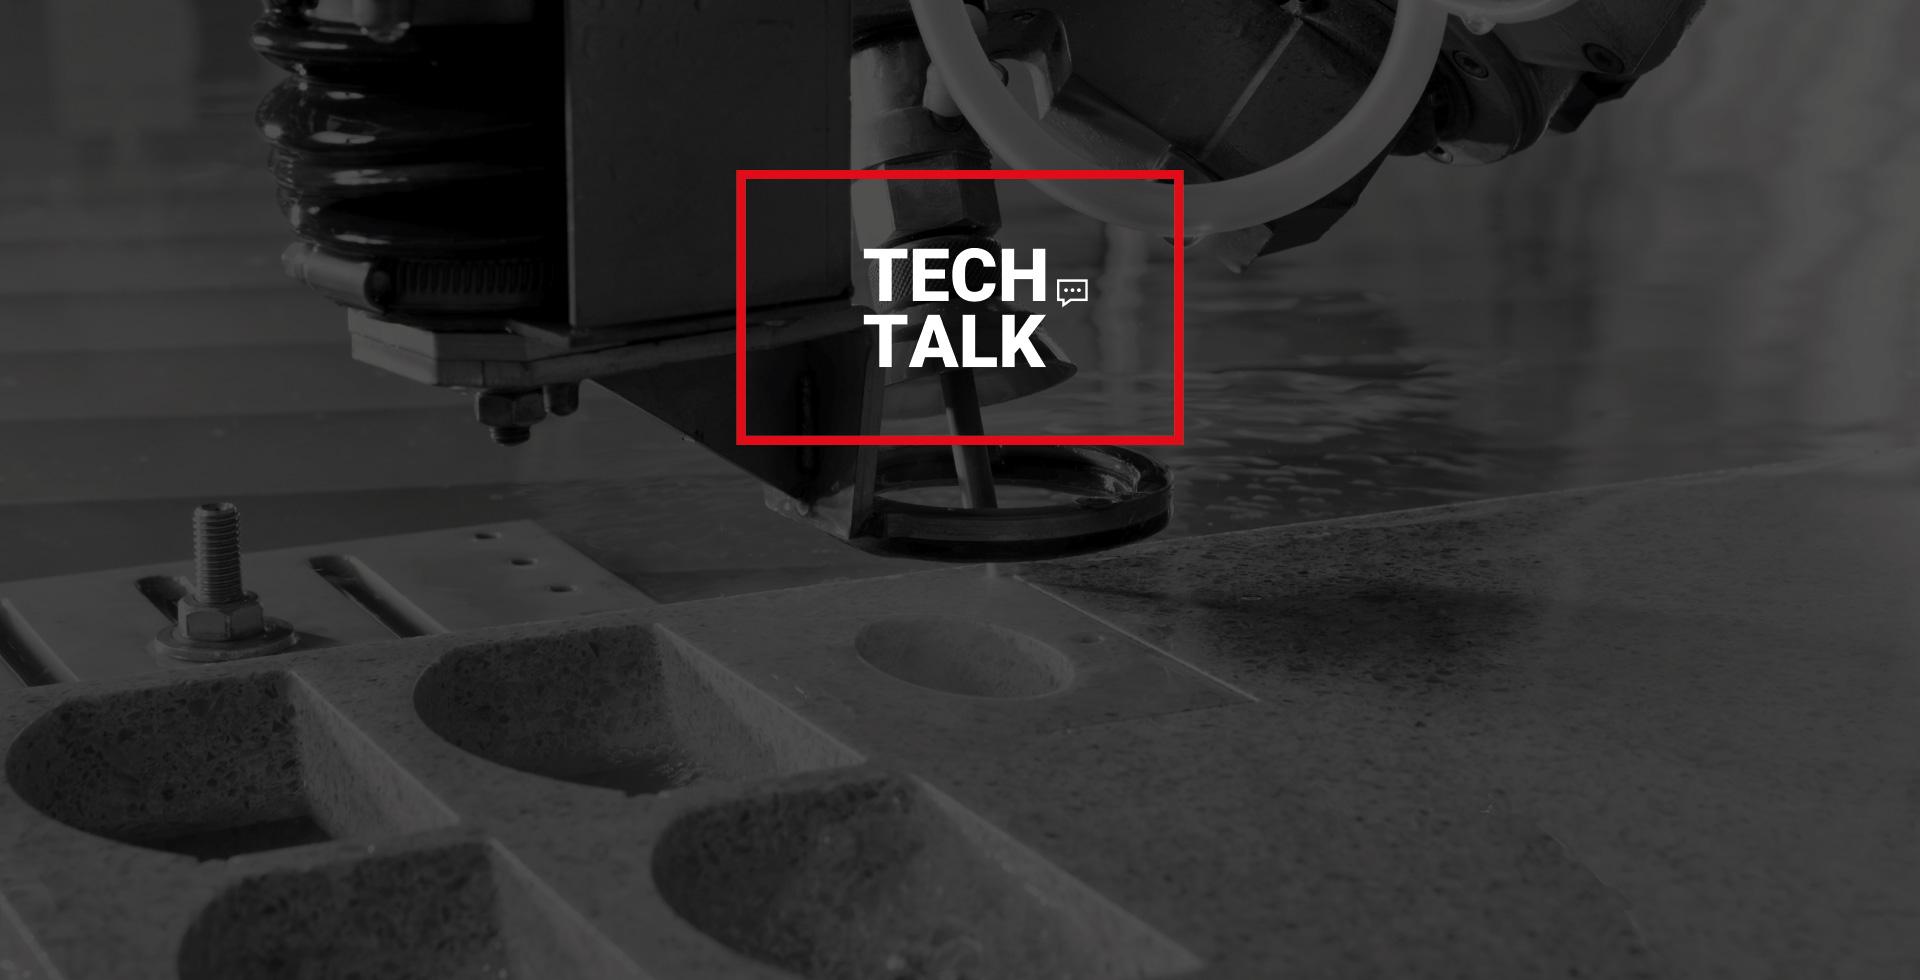 Tech Talk / Demo / Waterjet Primus 402